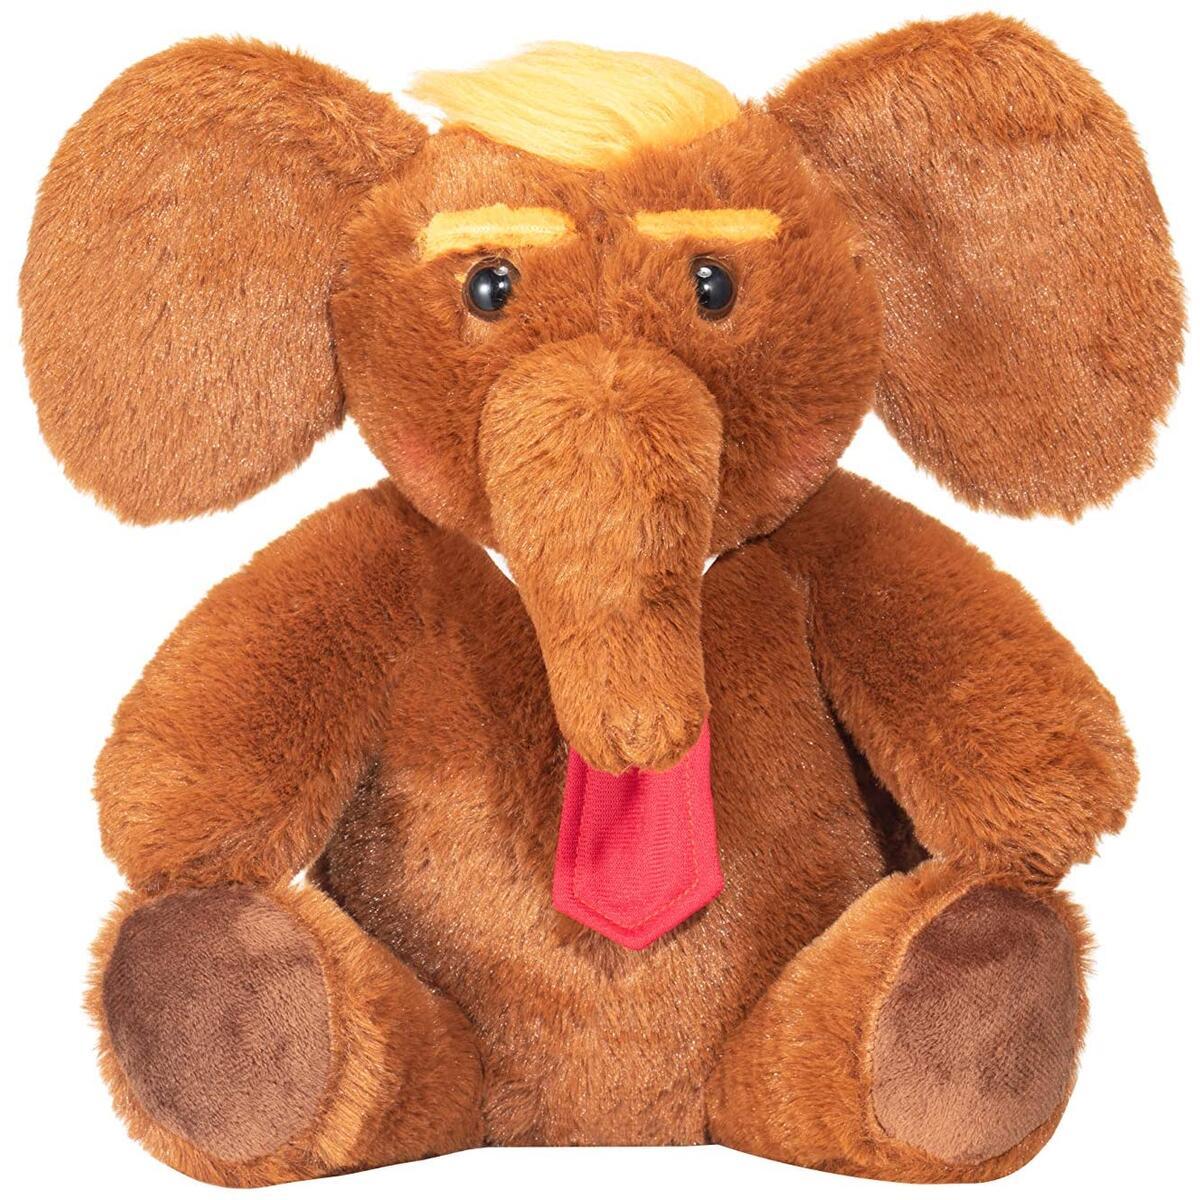 Donald Trump Elephant (Large)